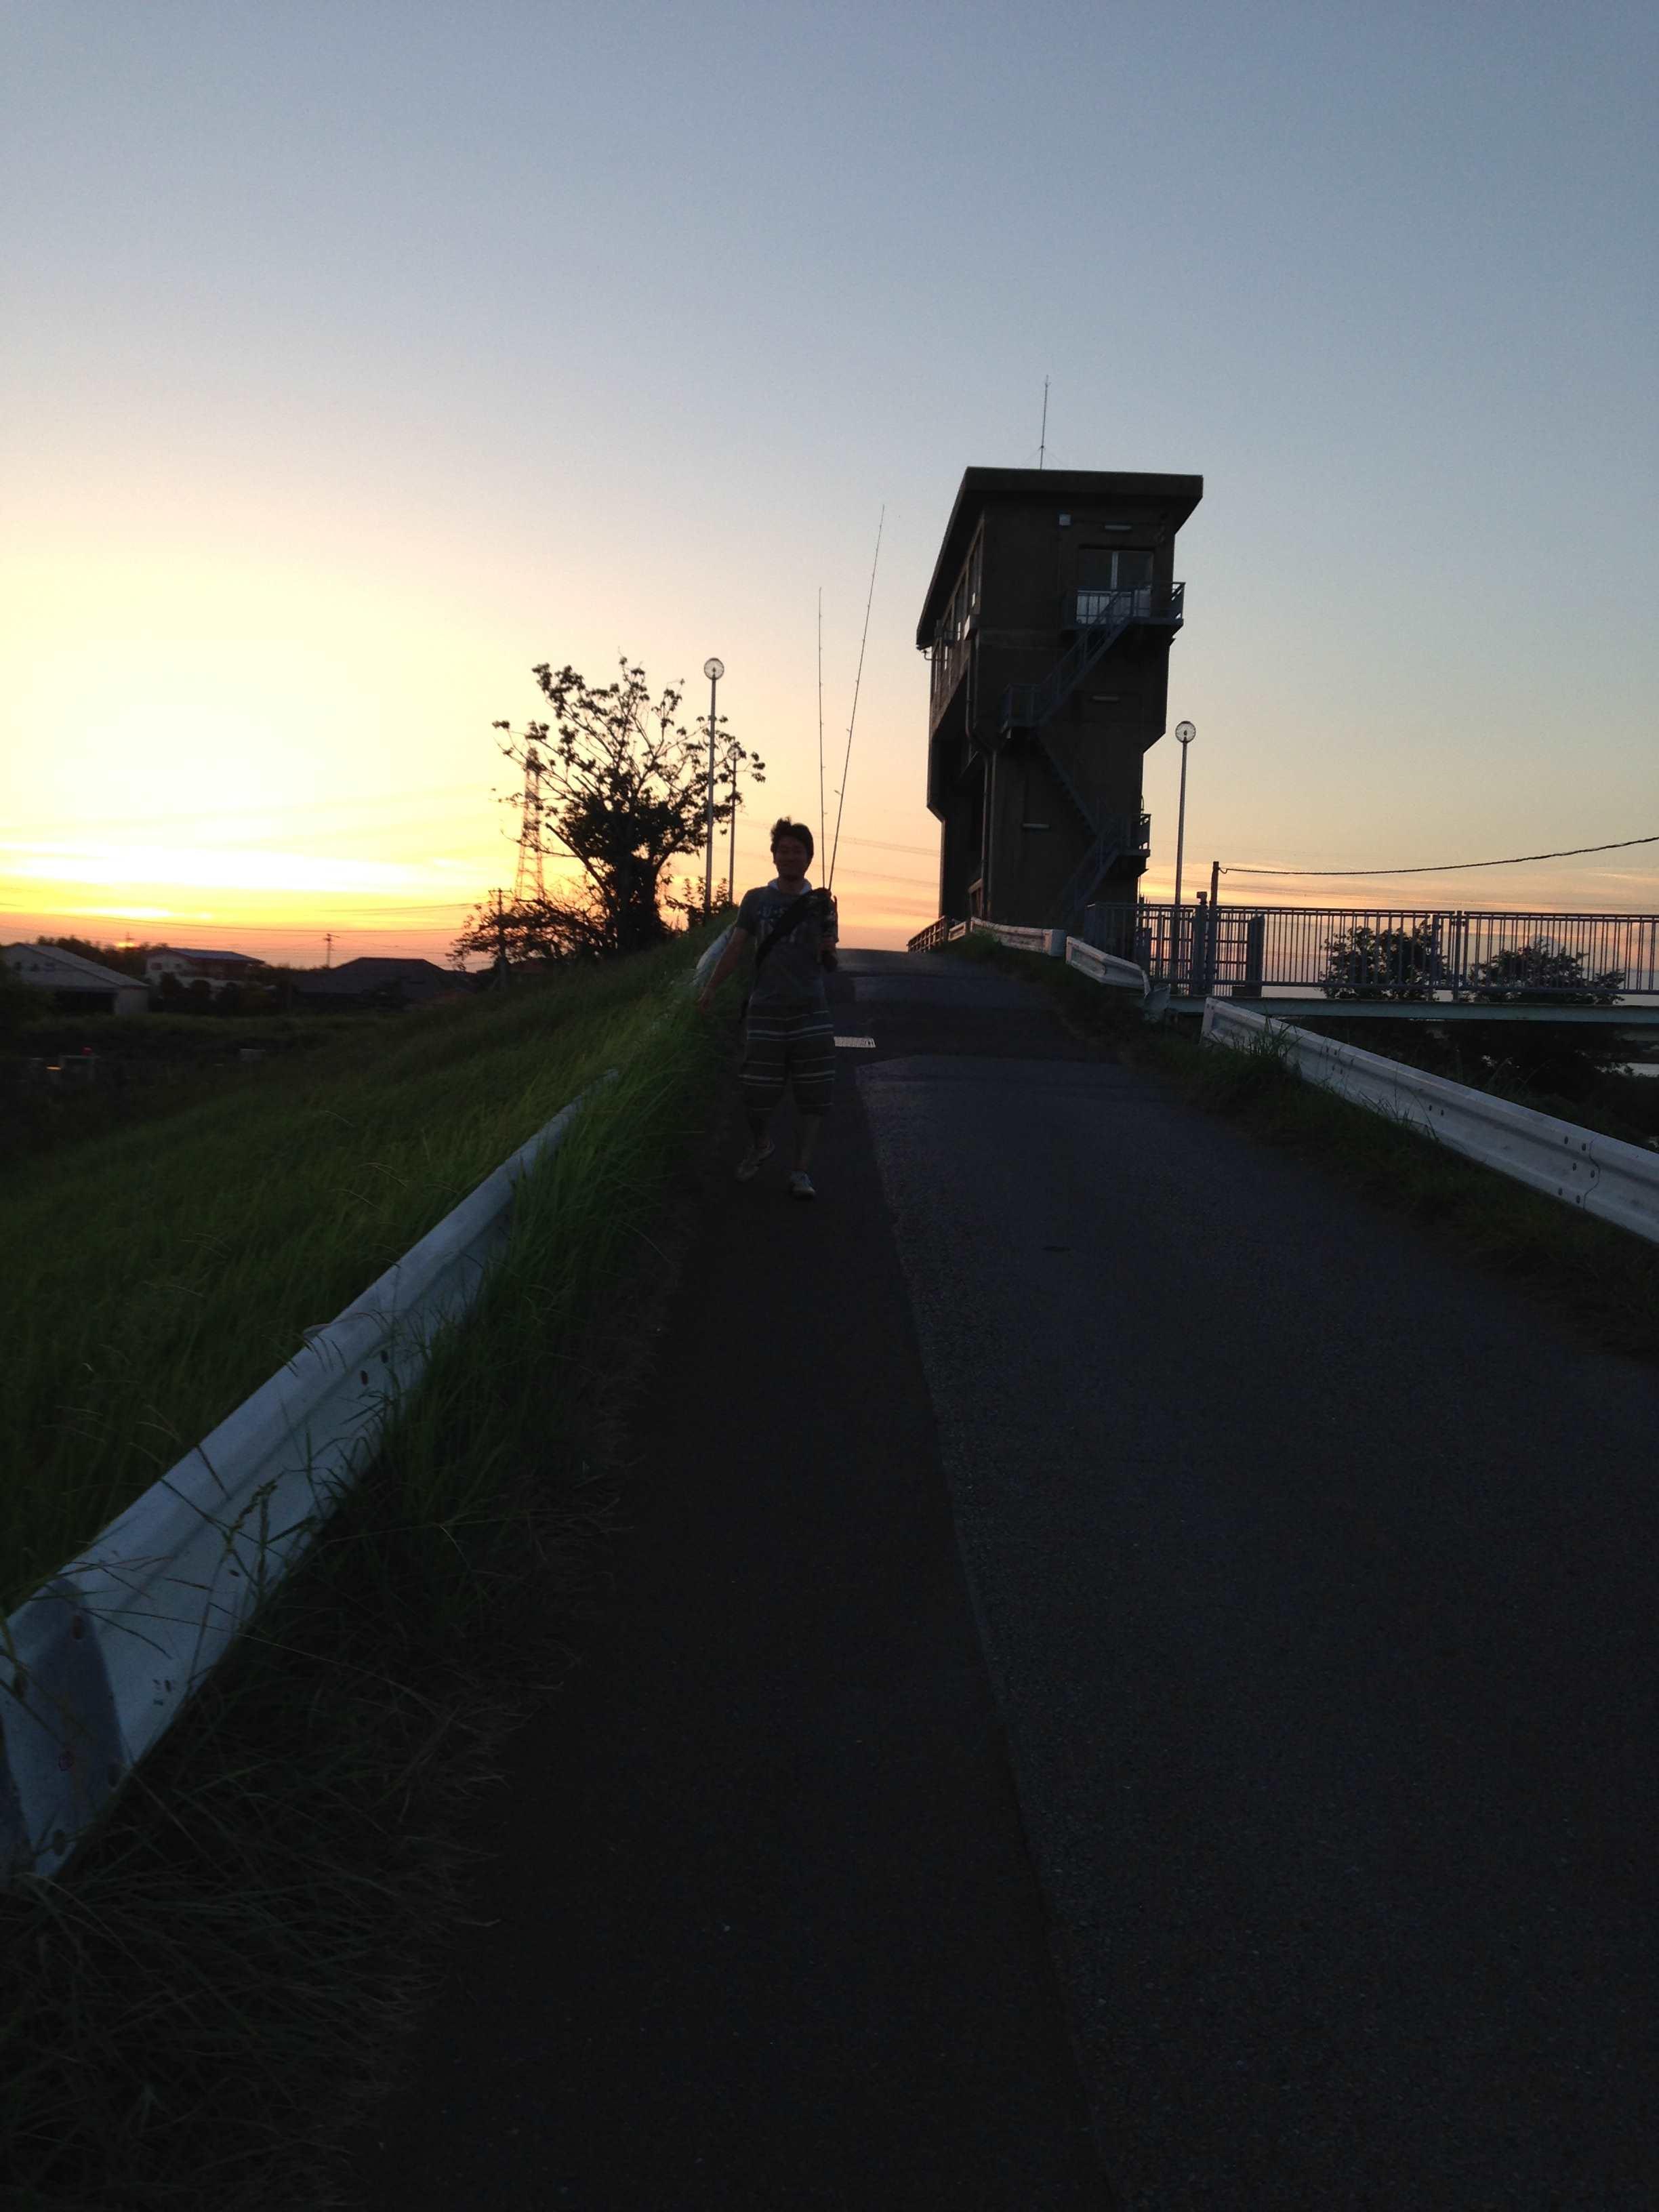 2014-08-06 18.34.38_R.jpg